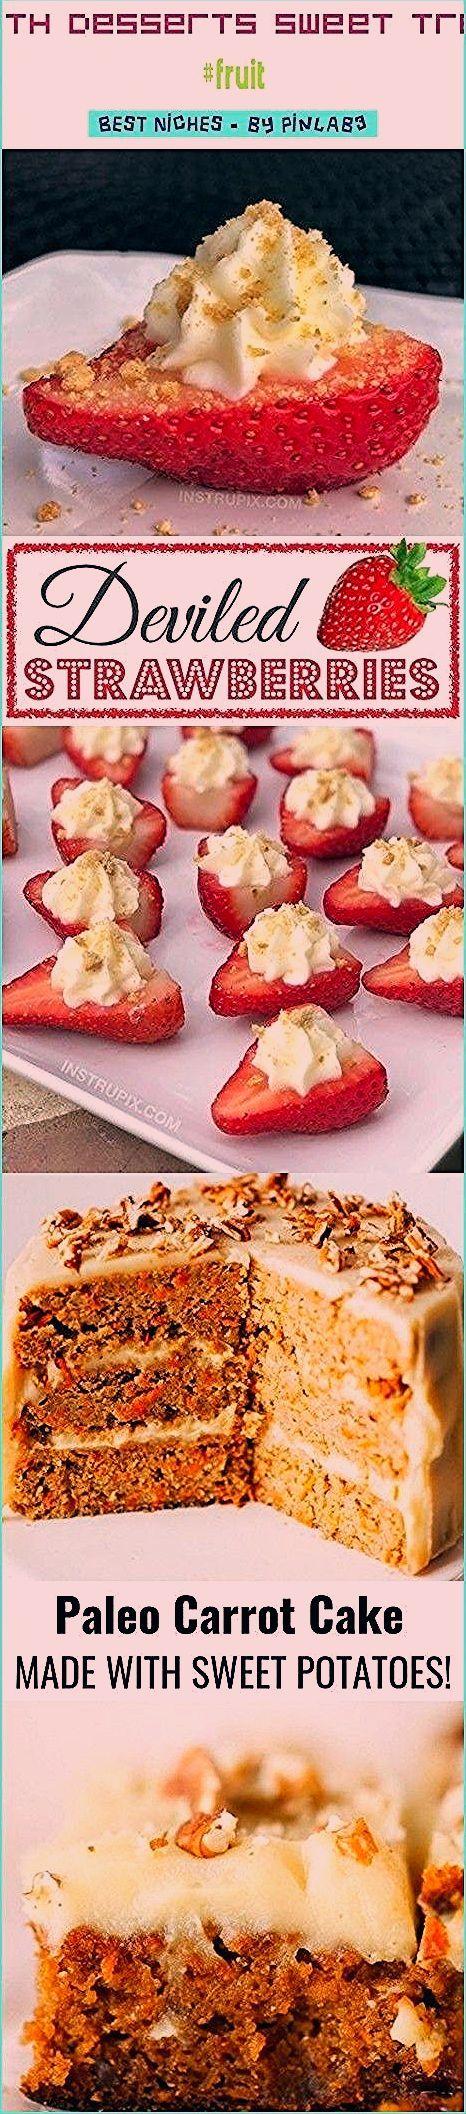 Photo of Health Desserts Under 100 Calories